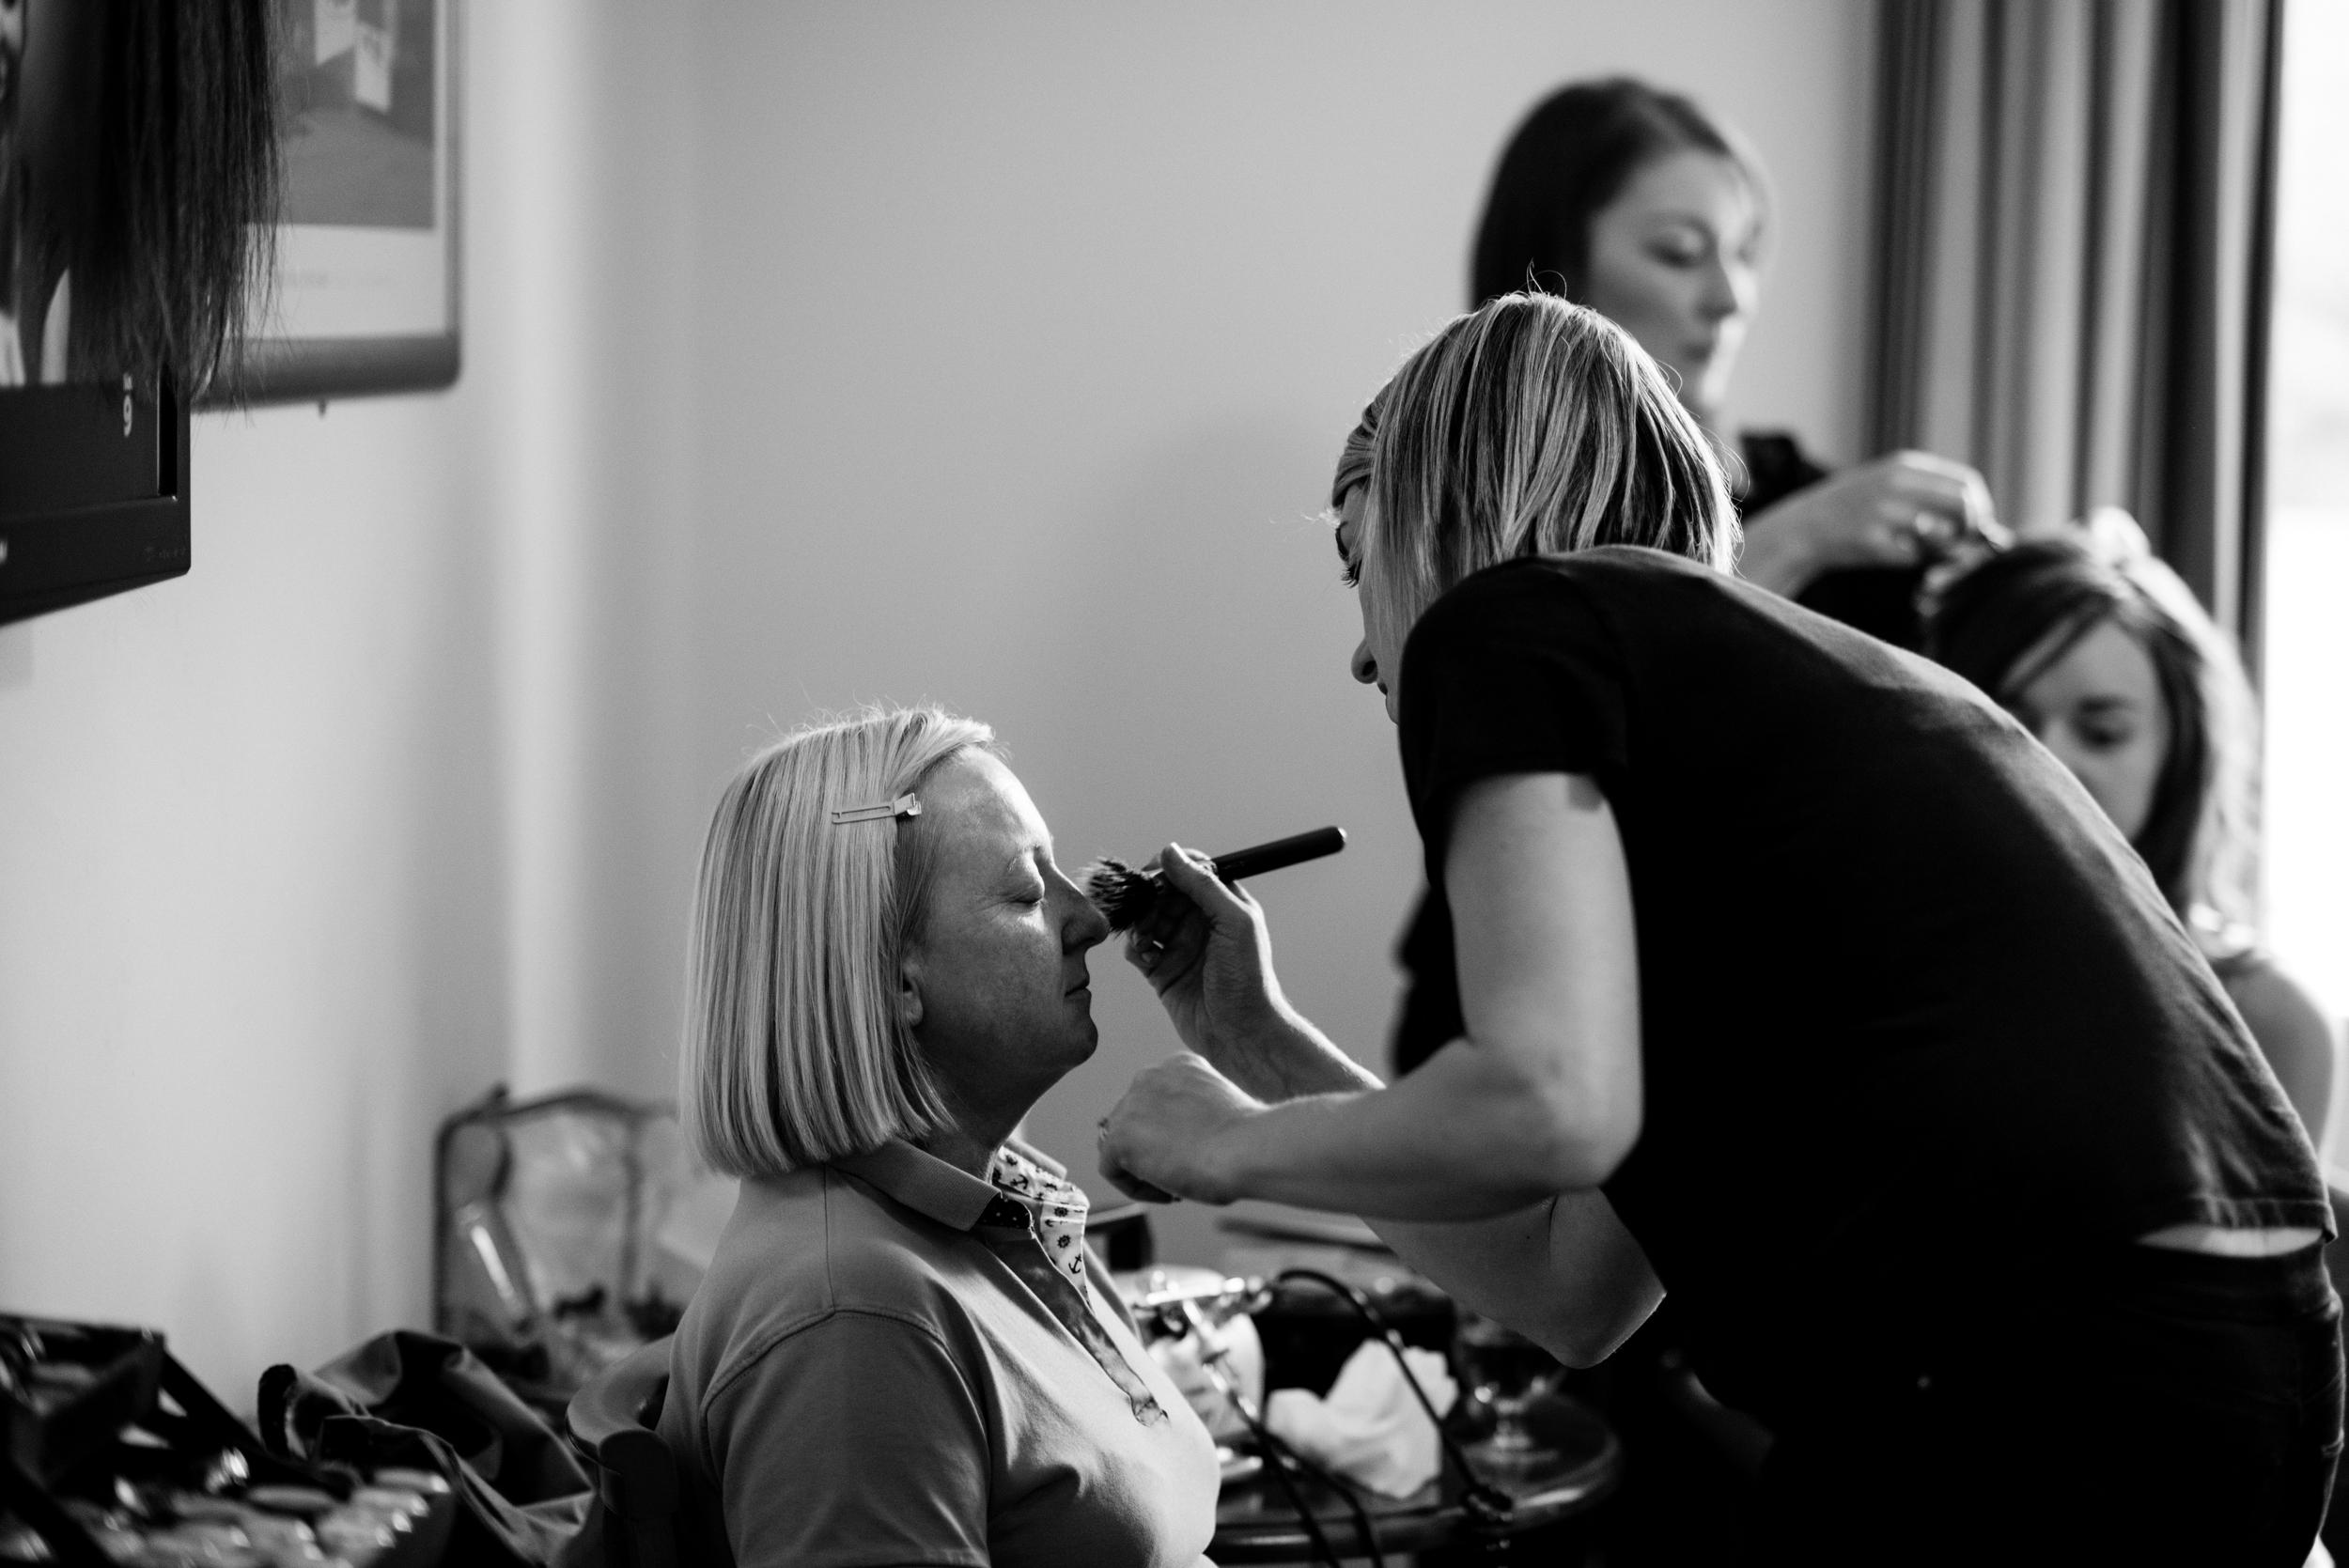 Northern_Ireland_Wedding_Photographer_Purephotoni_Dunsilly_Hotel_Wedding_Mother_of_the_Bride